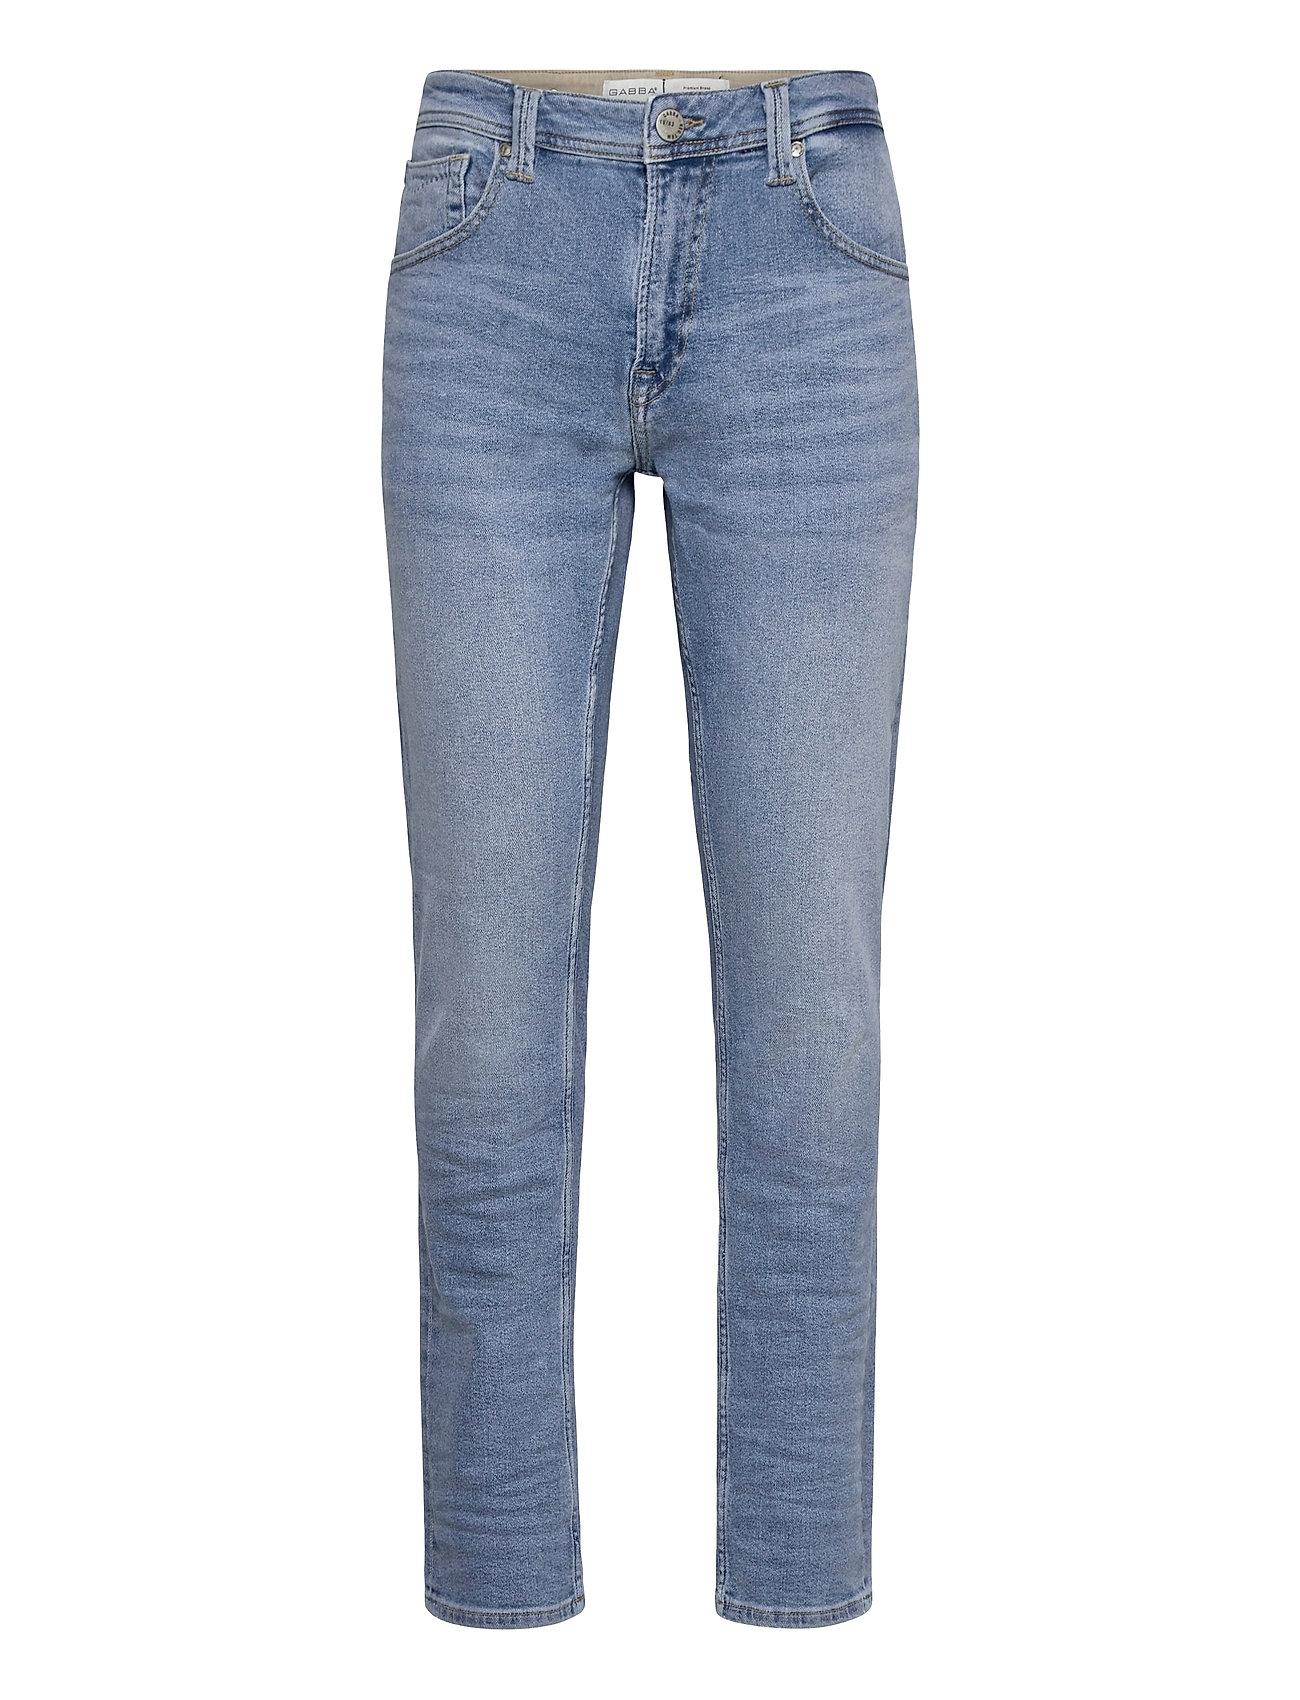 Image of Nico K3922 Jeans Jeans Blå Gabba (3489045837)